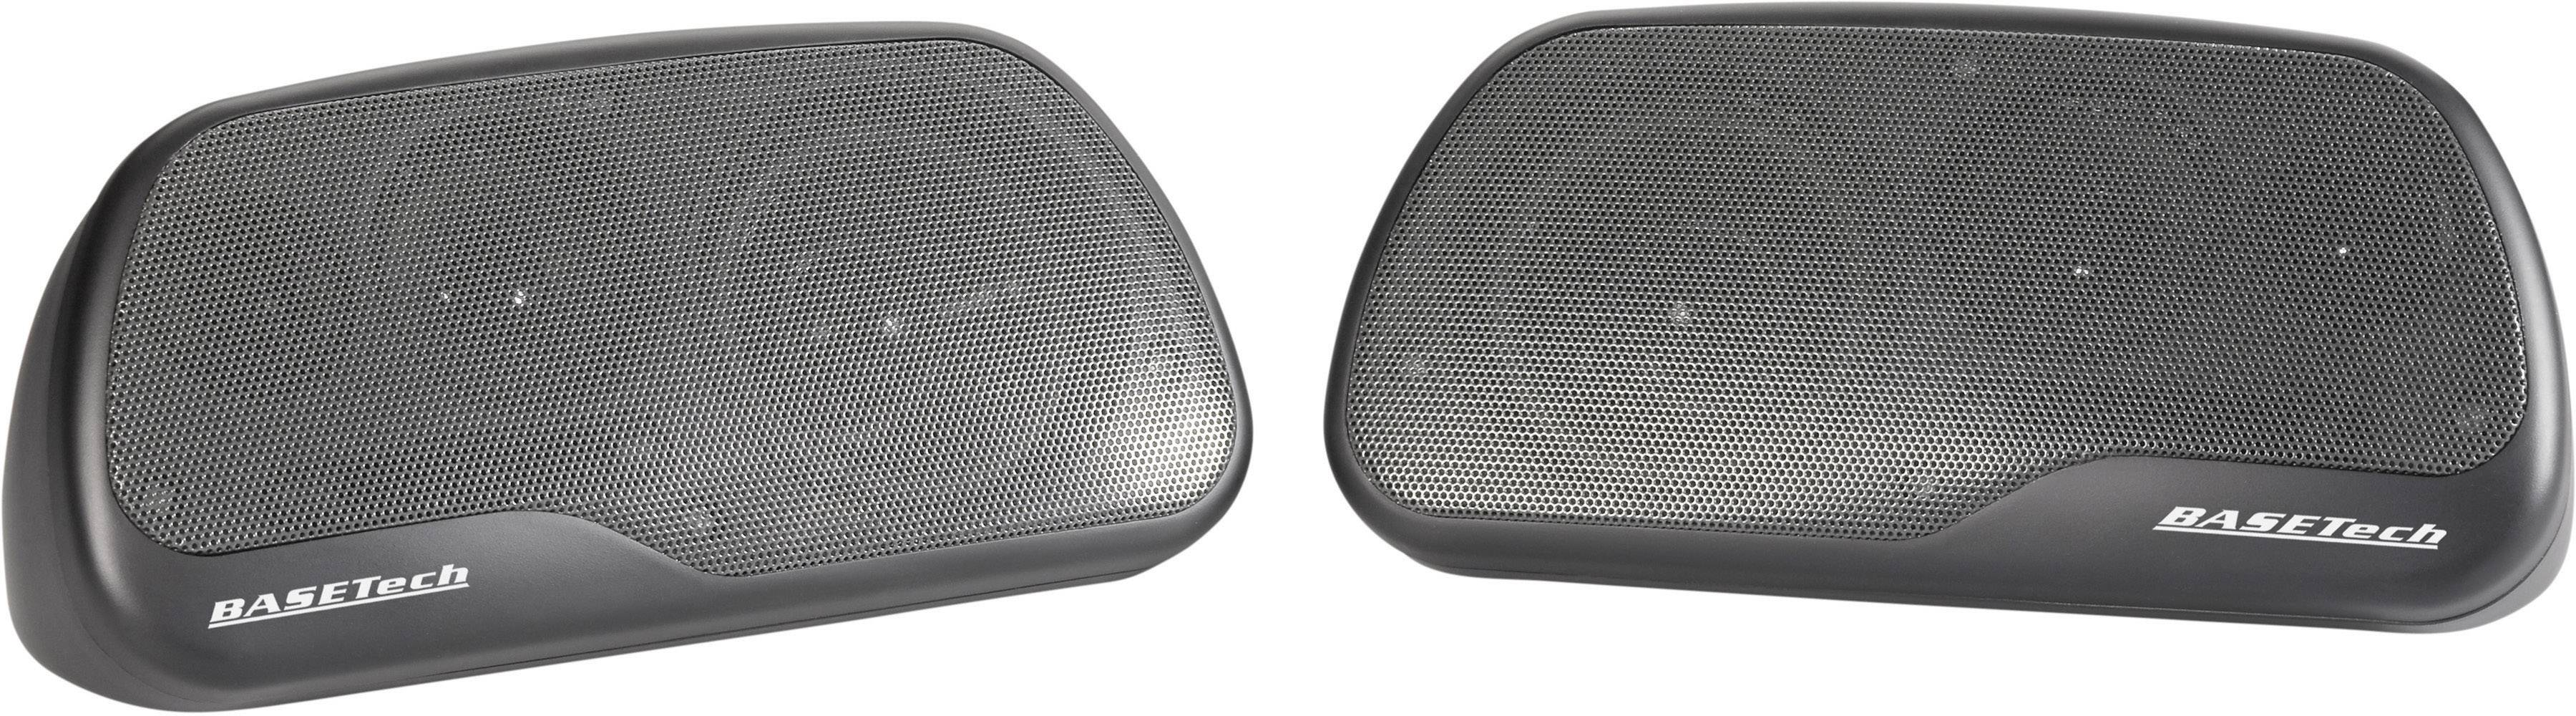 3cestný triaxiální reproduktor Basetech CPS-890, 120 W, 1 pár